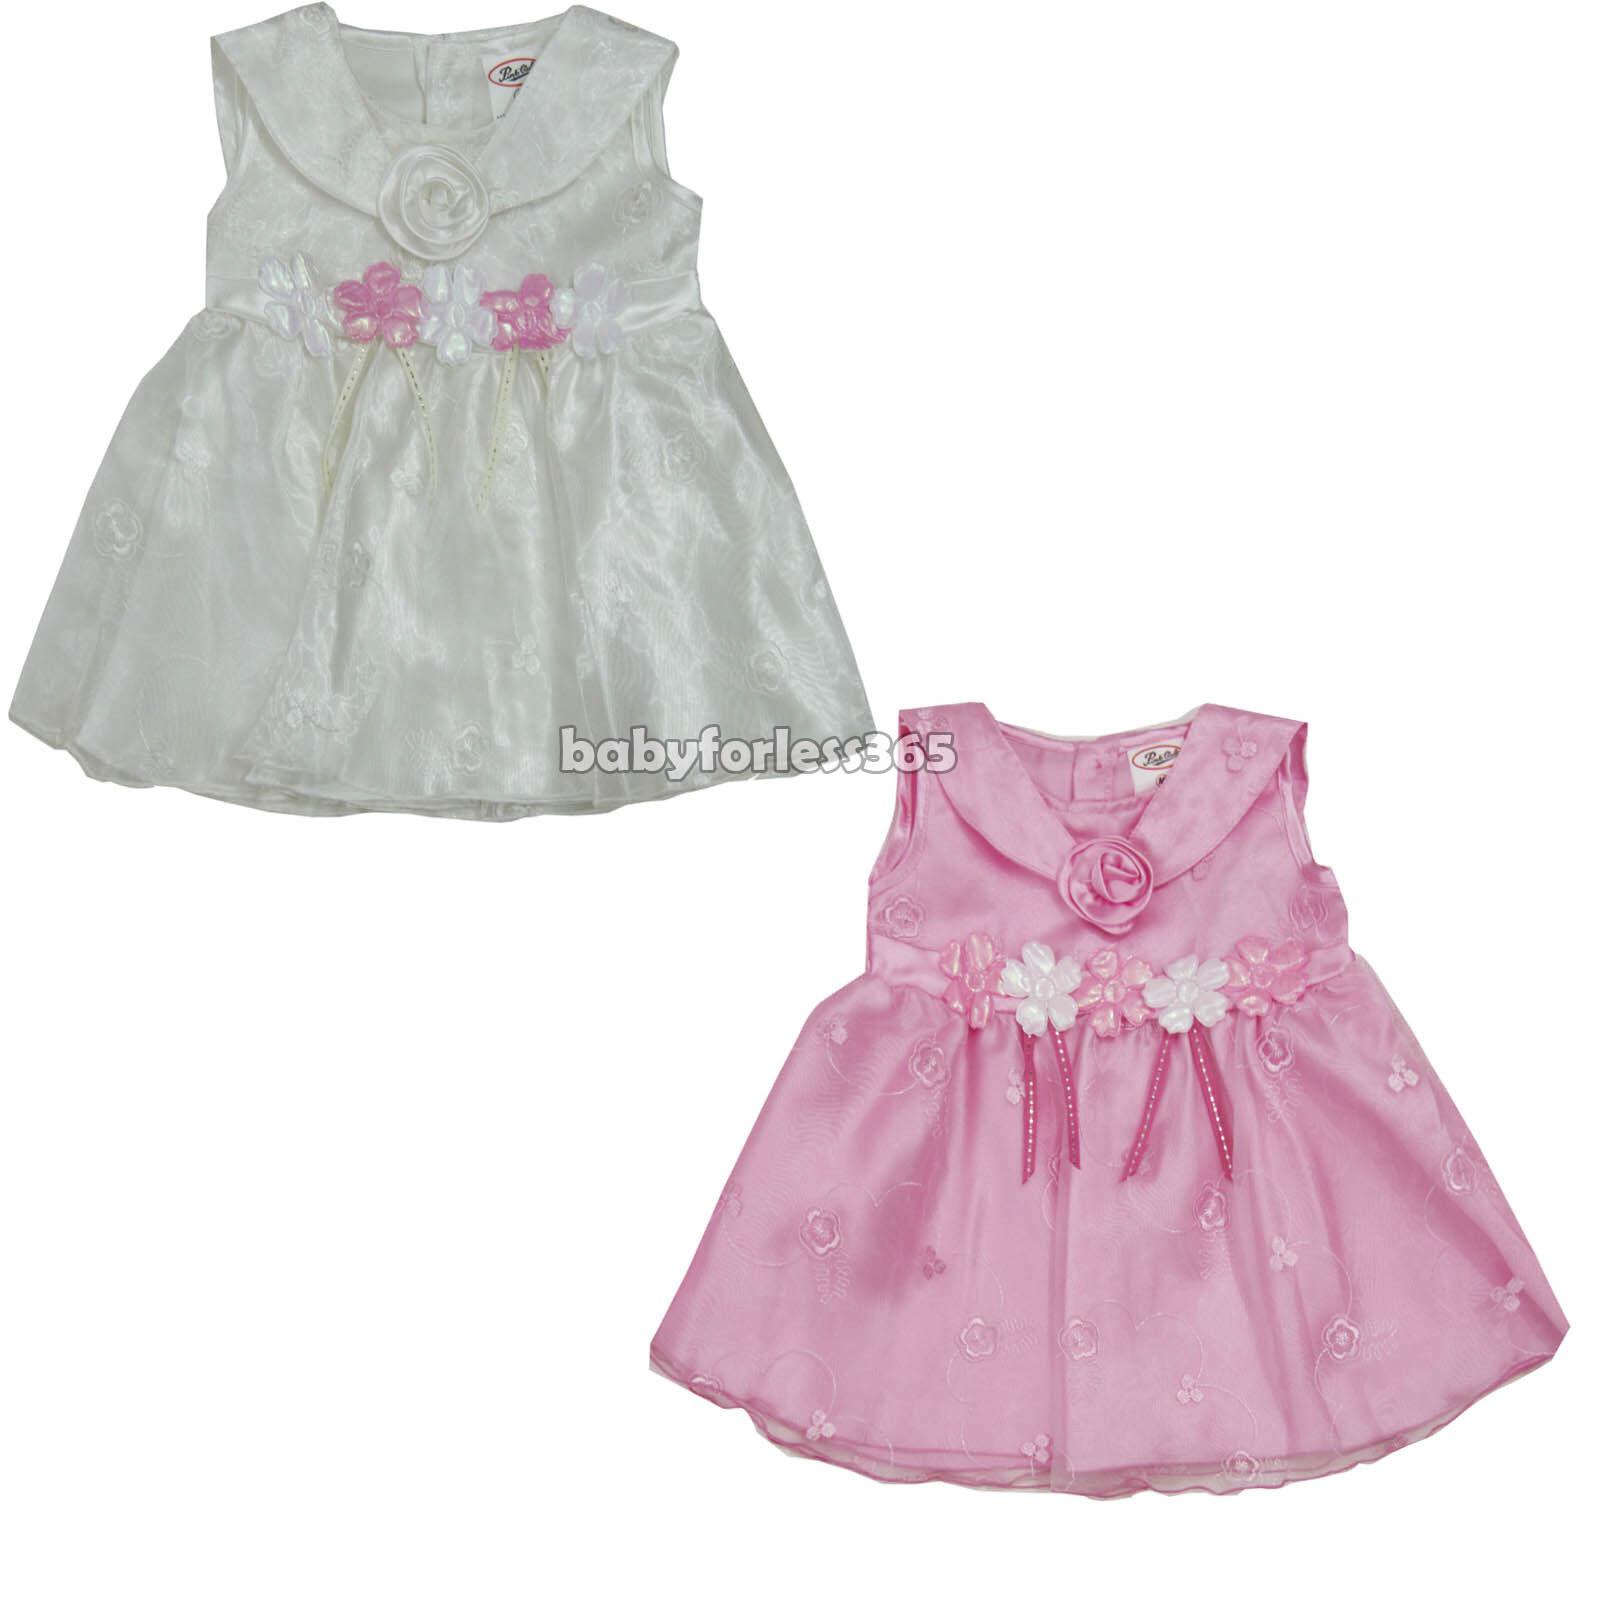 newborn infant baby girl dress 2 pieces set clothing